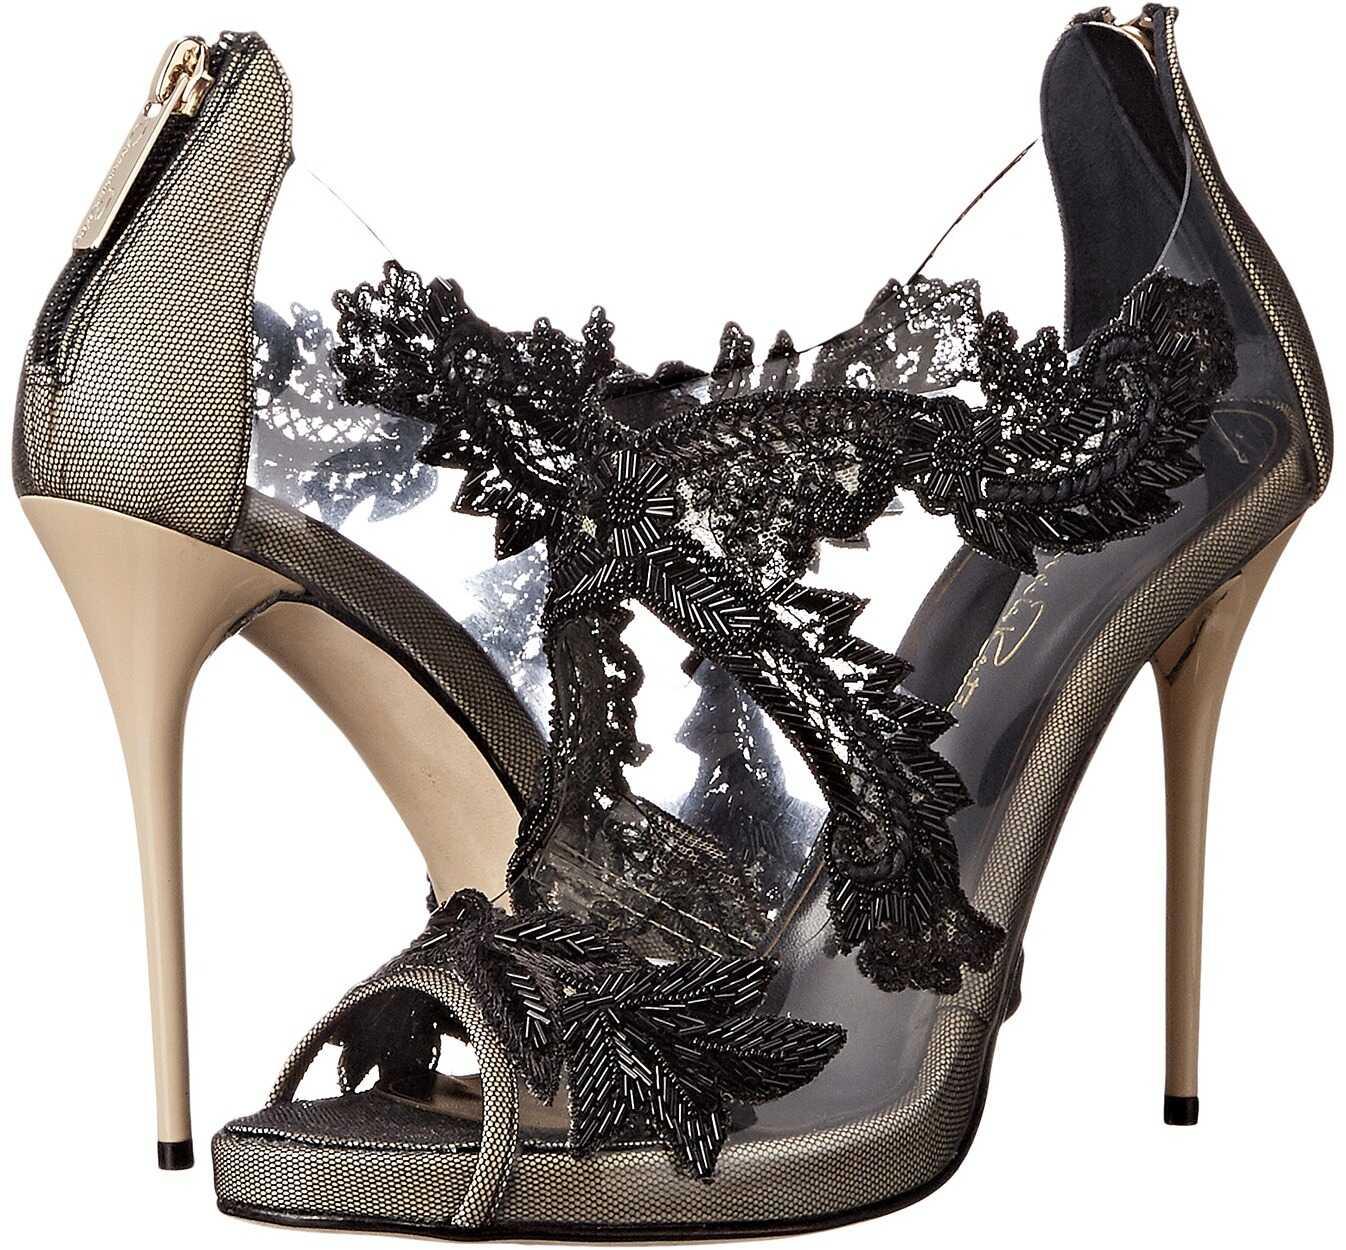 Oscar de la Renta Ambria 115mm Beige/Black Patent Leather